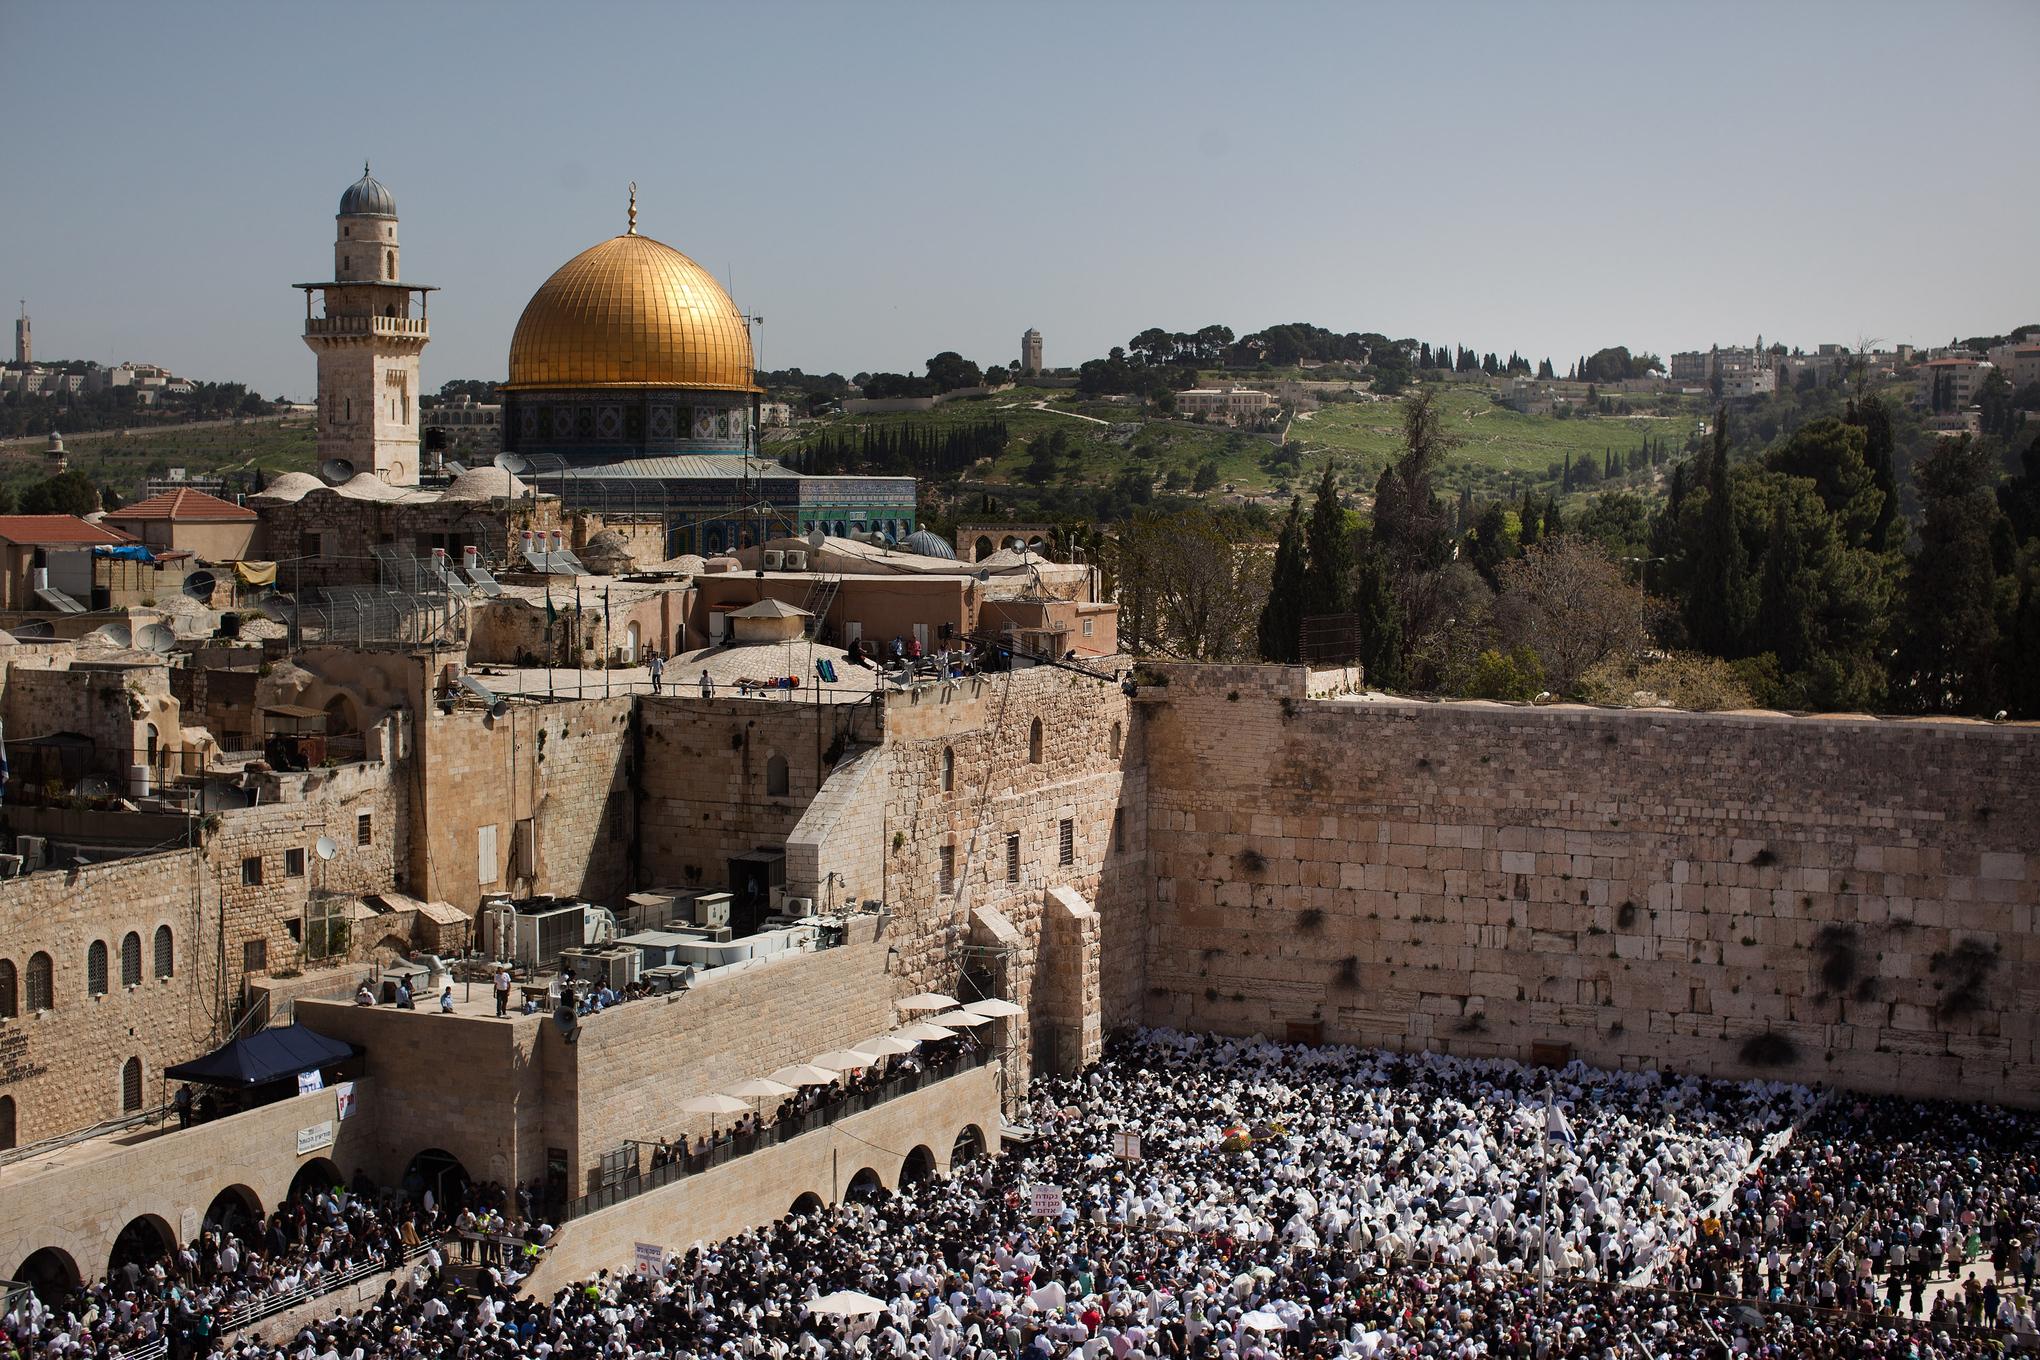 2040 x 1360 jpeg 1911kBJerusalem